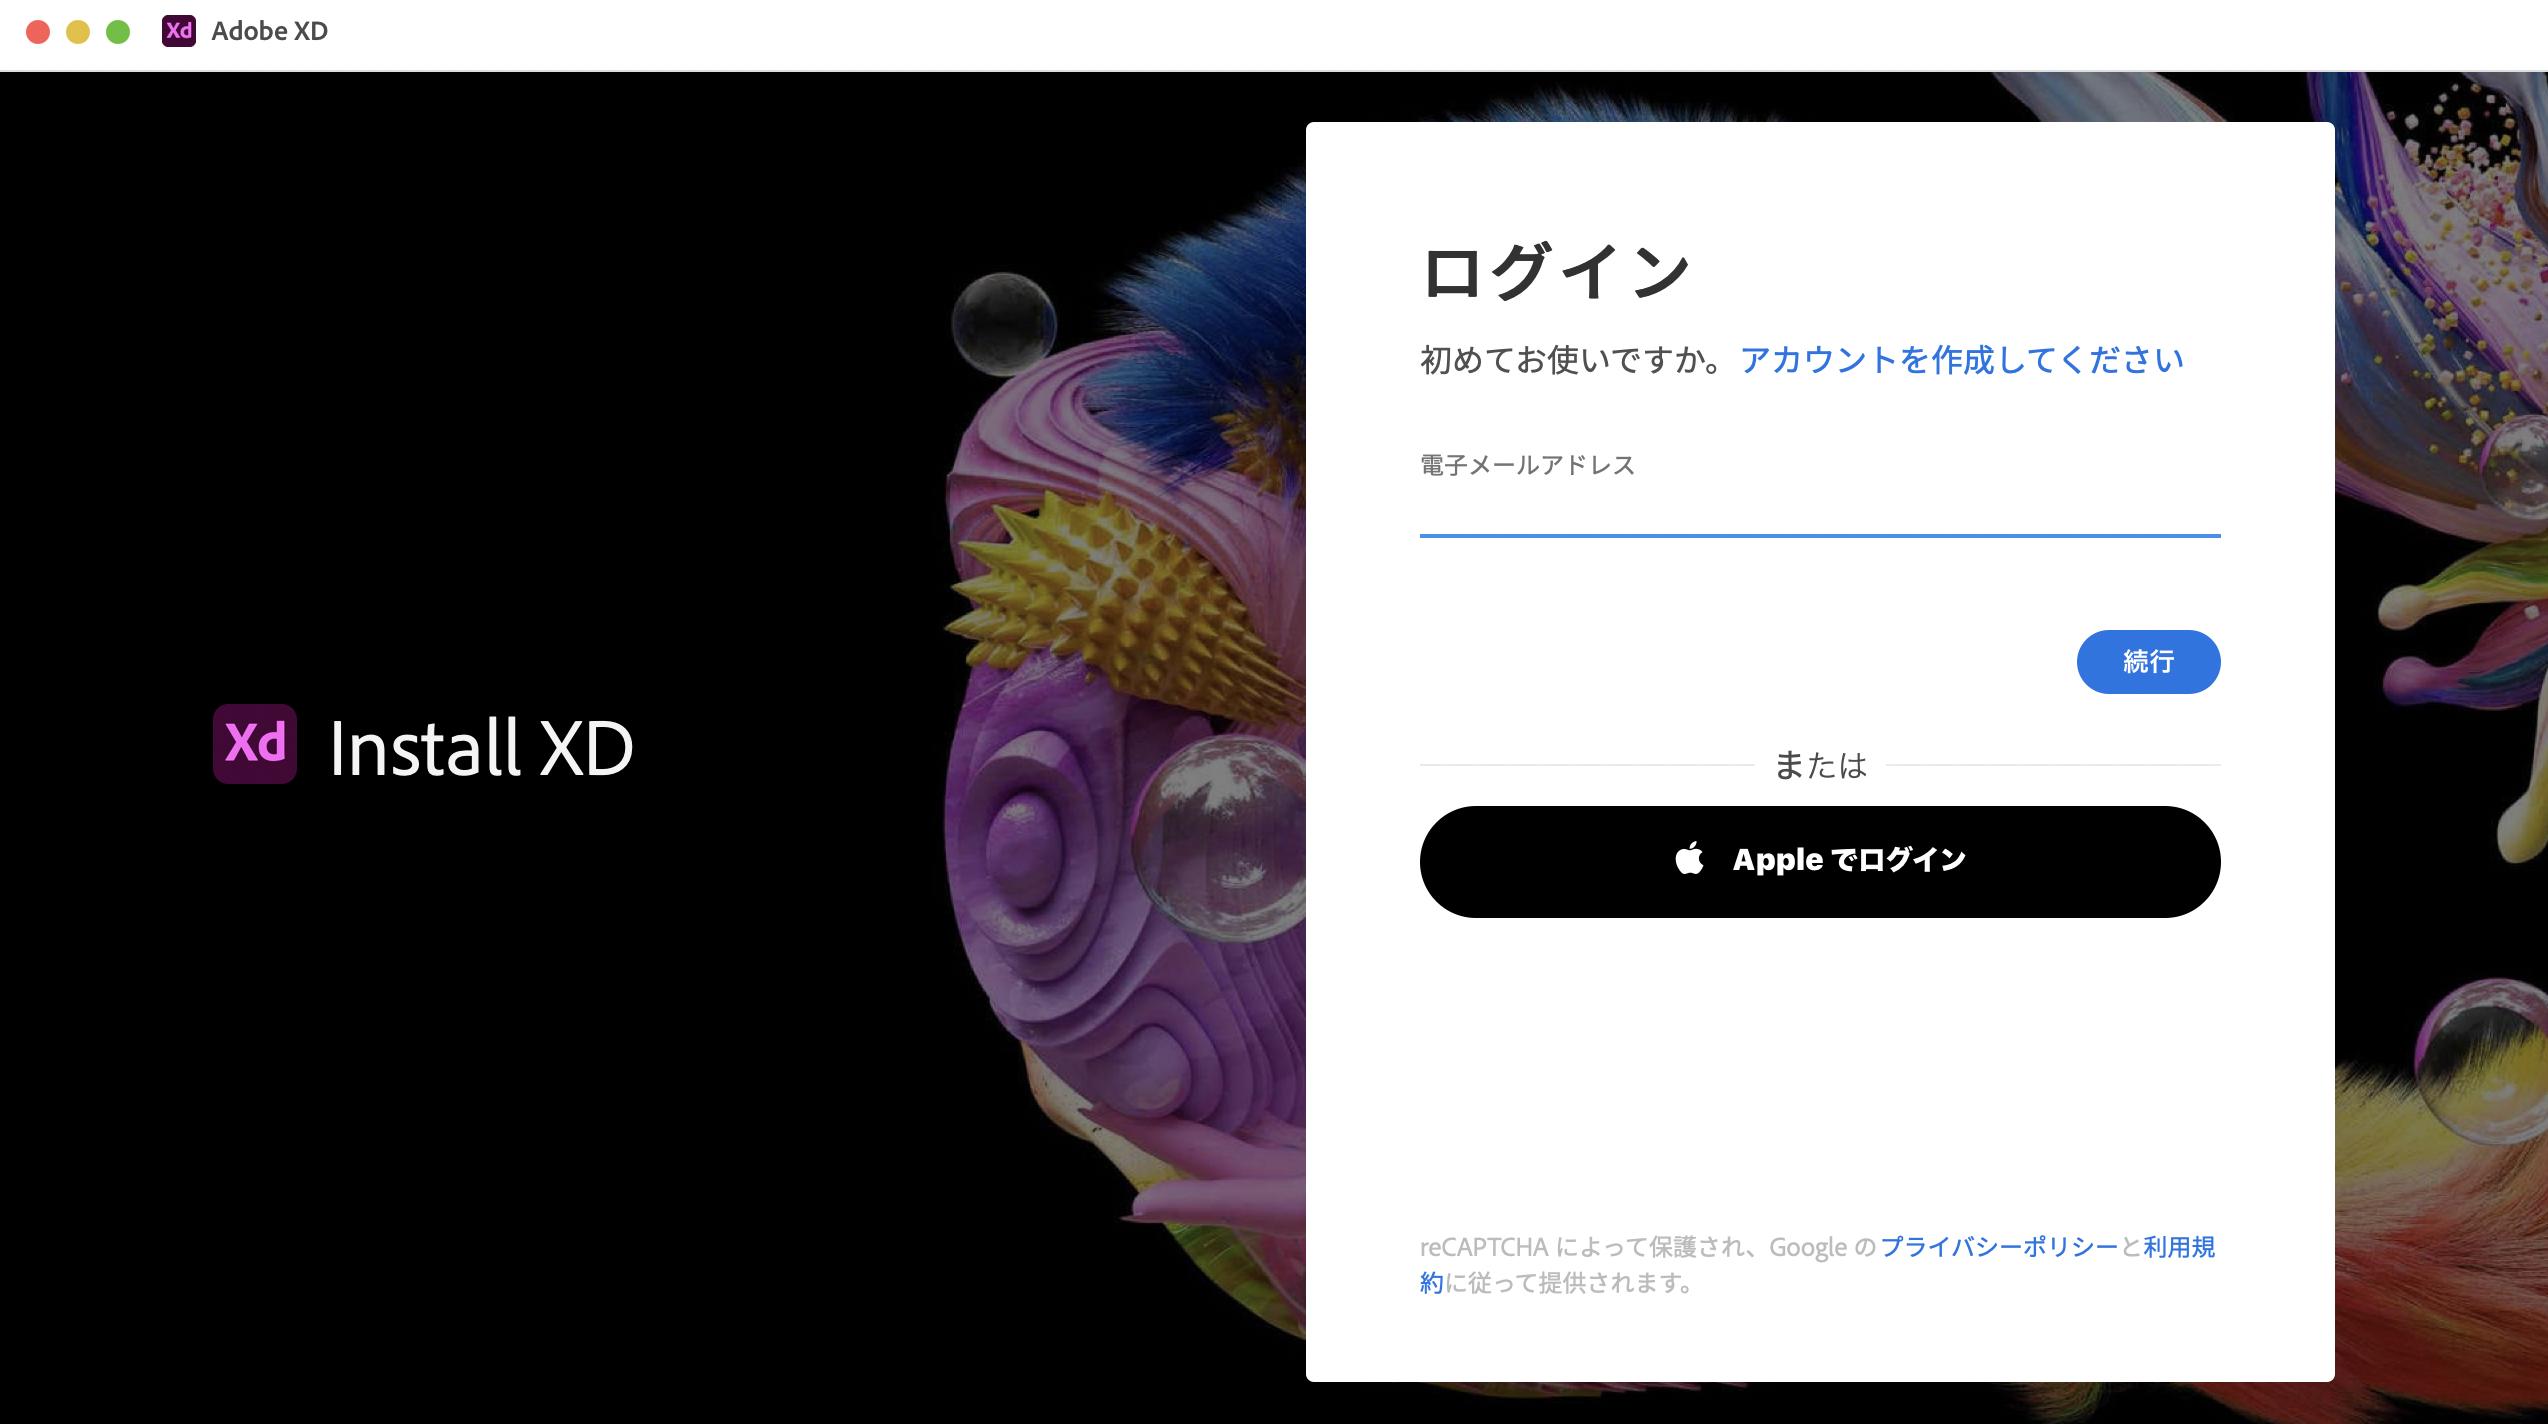 Adobe ユーザ登録